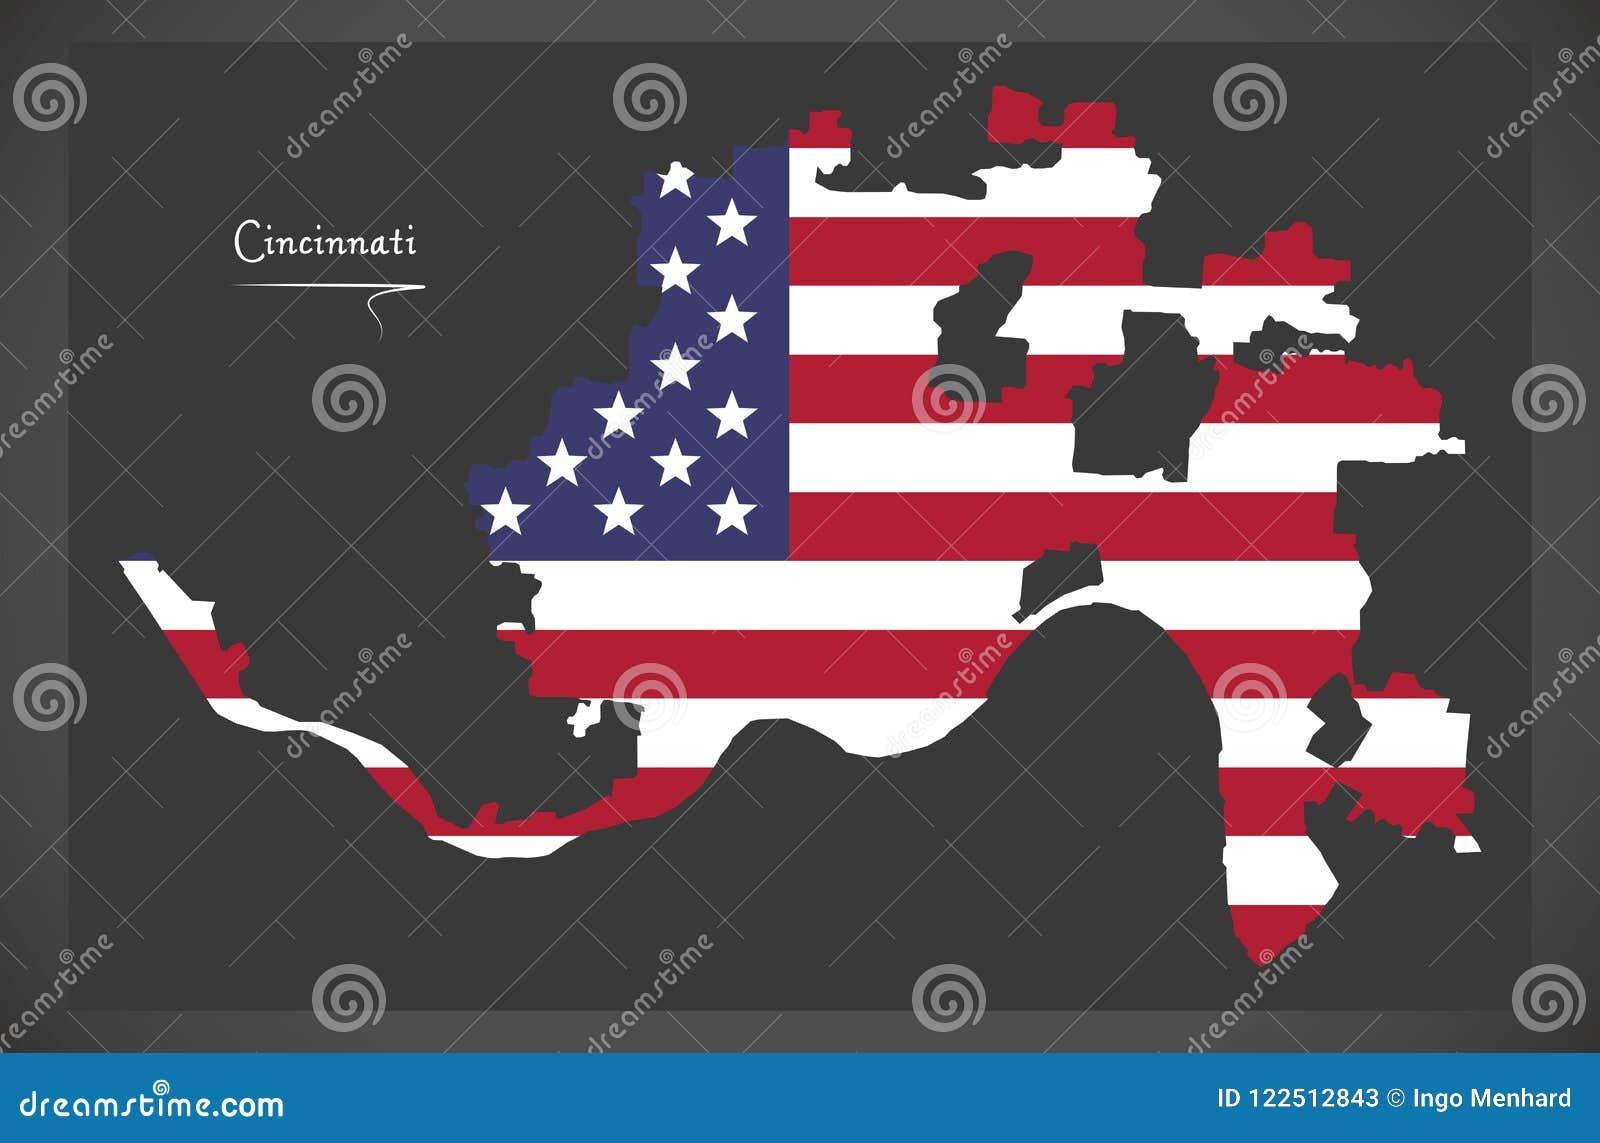 Mapa De Cincinnati Ohio Com Ilustracao Americana Da Bandeira